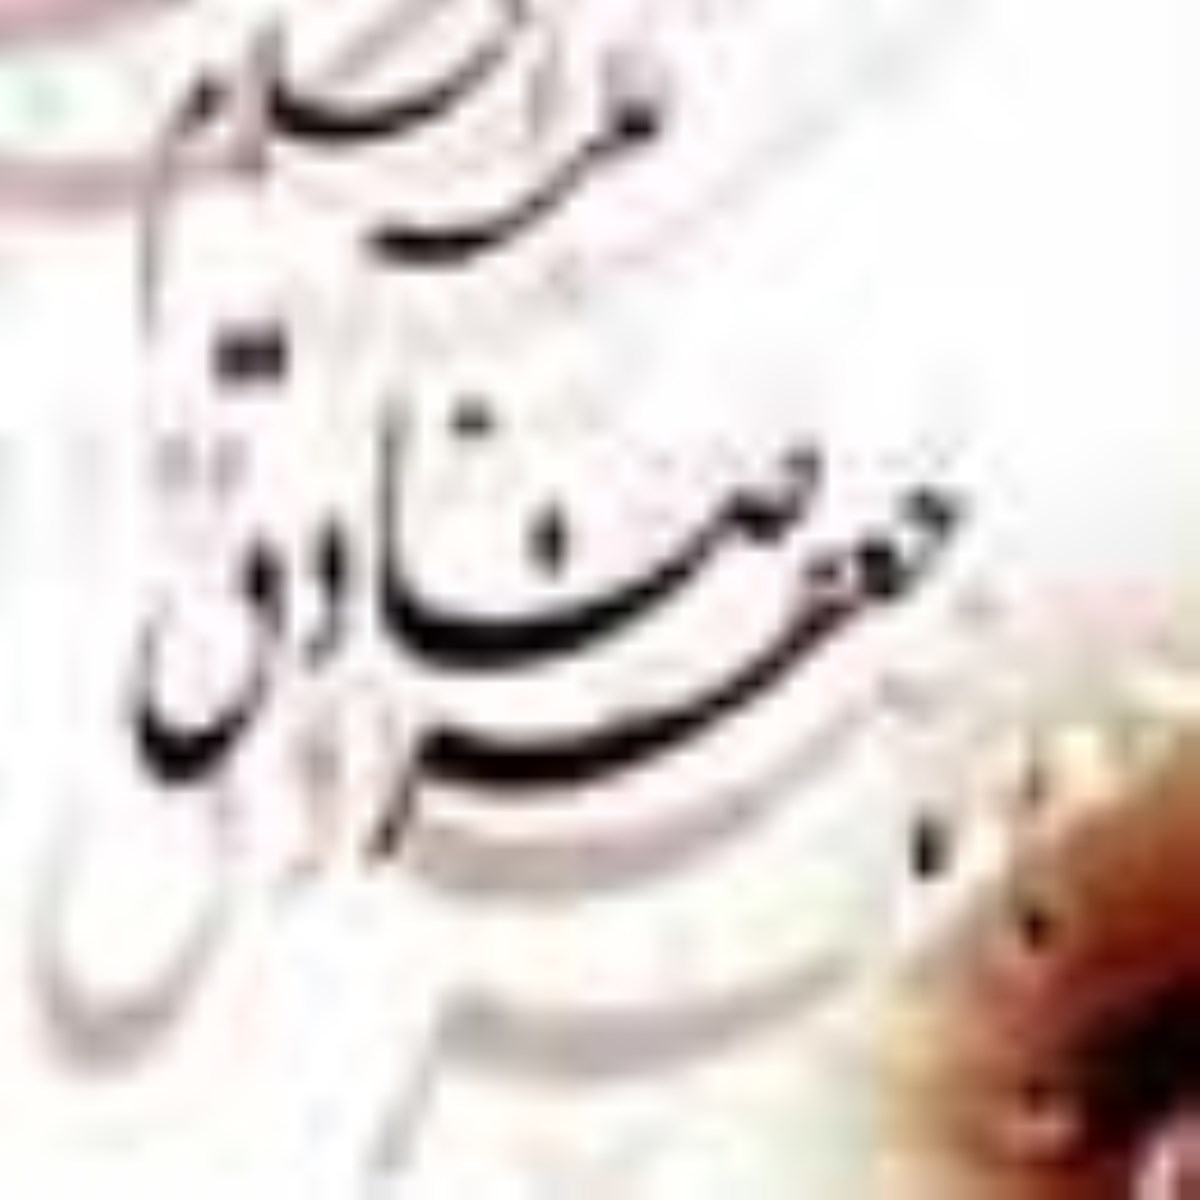 زهد  از منظر اسلام در مناظره  امام صادق  علیه السلام  با  صوفیان